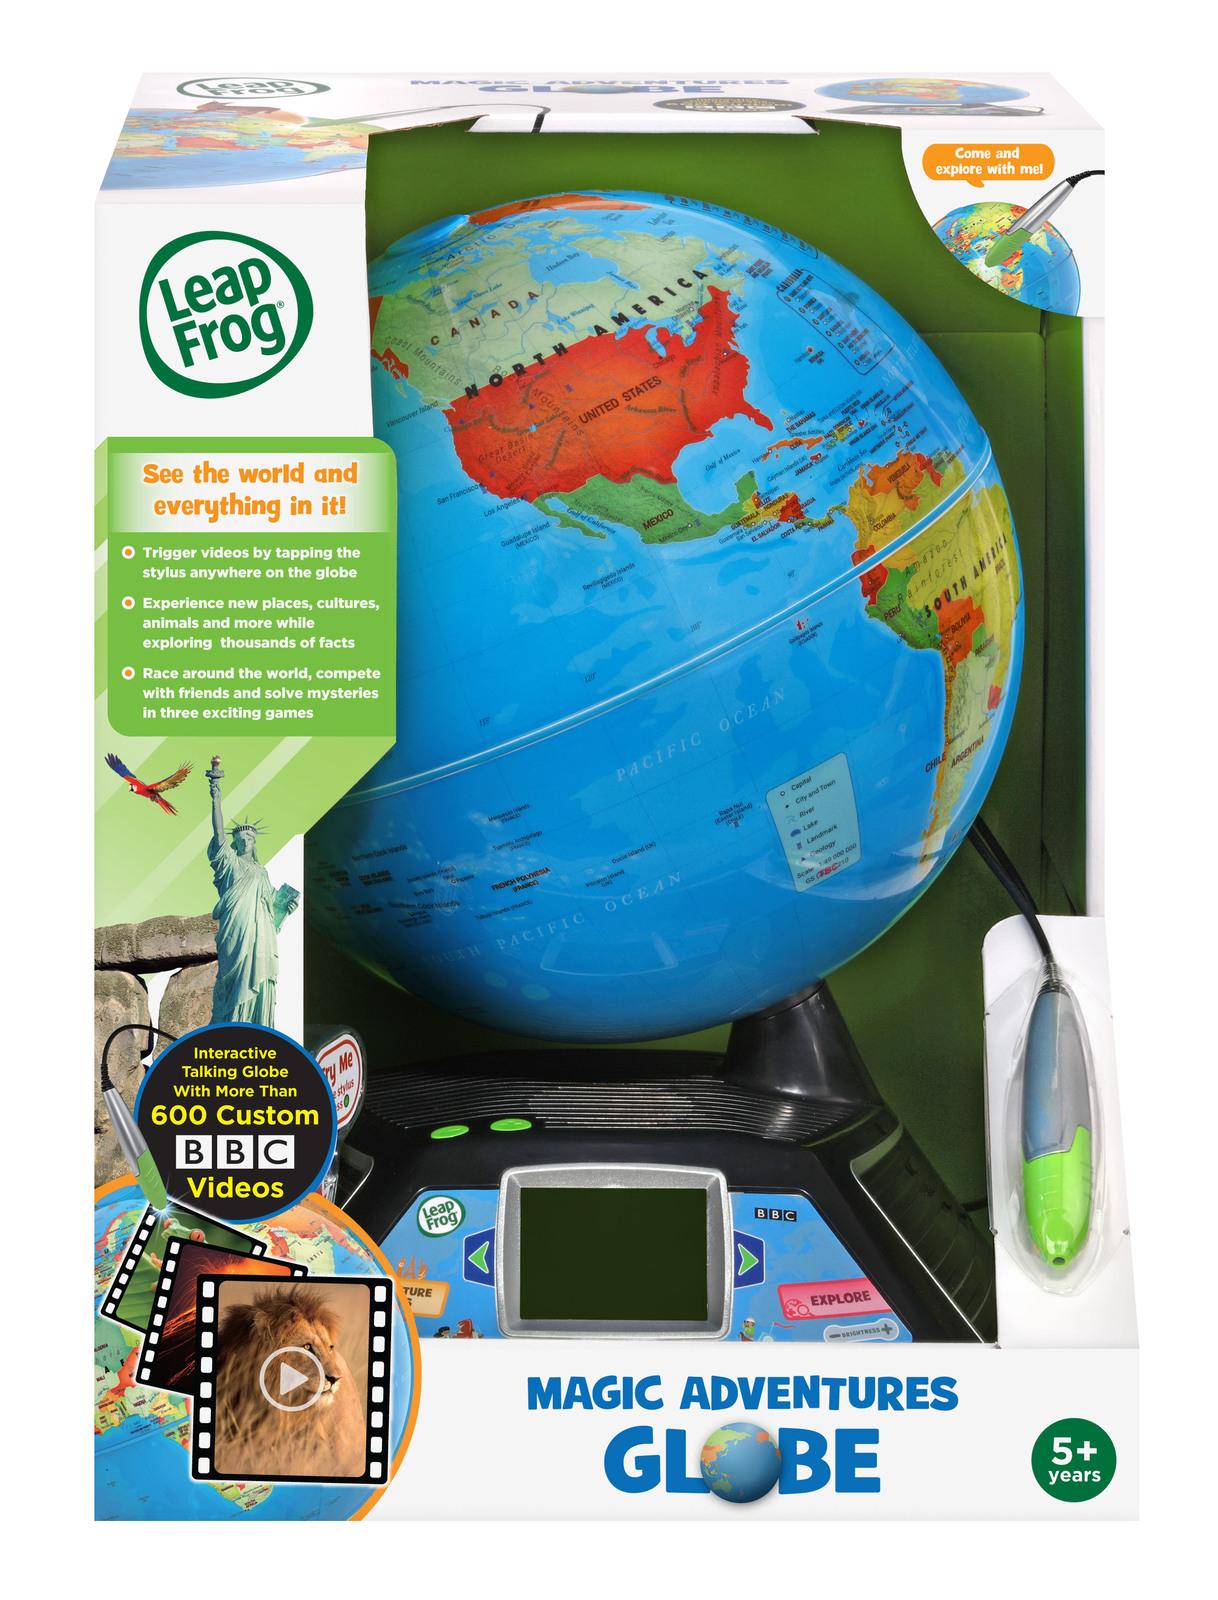 Leapfrog: Magic Adventures Globe - Interactive Learning Set image